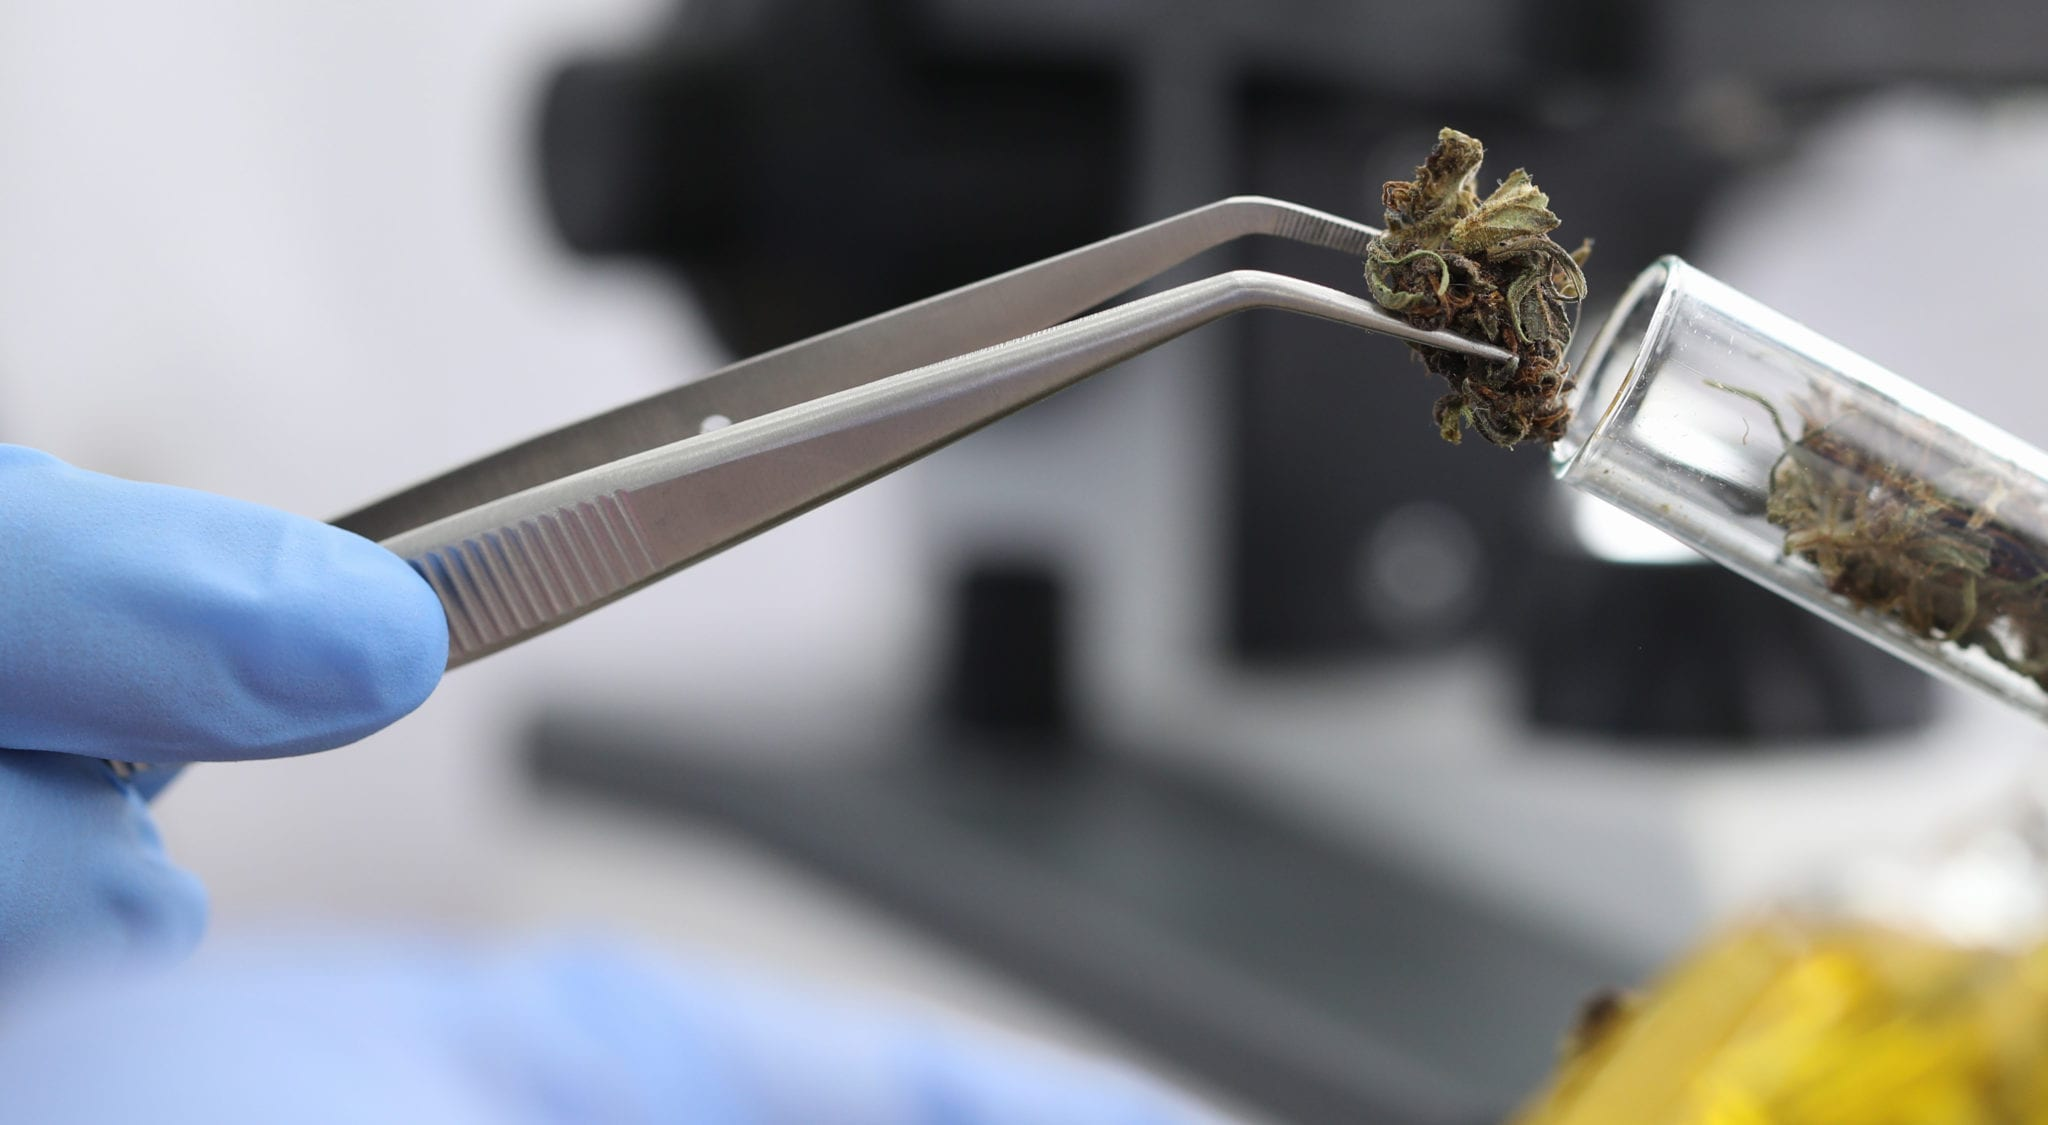 Tetra Bio-Pharma gets 5th orphan drug status for CBD topical